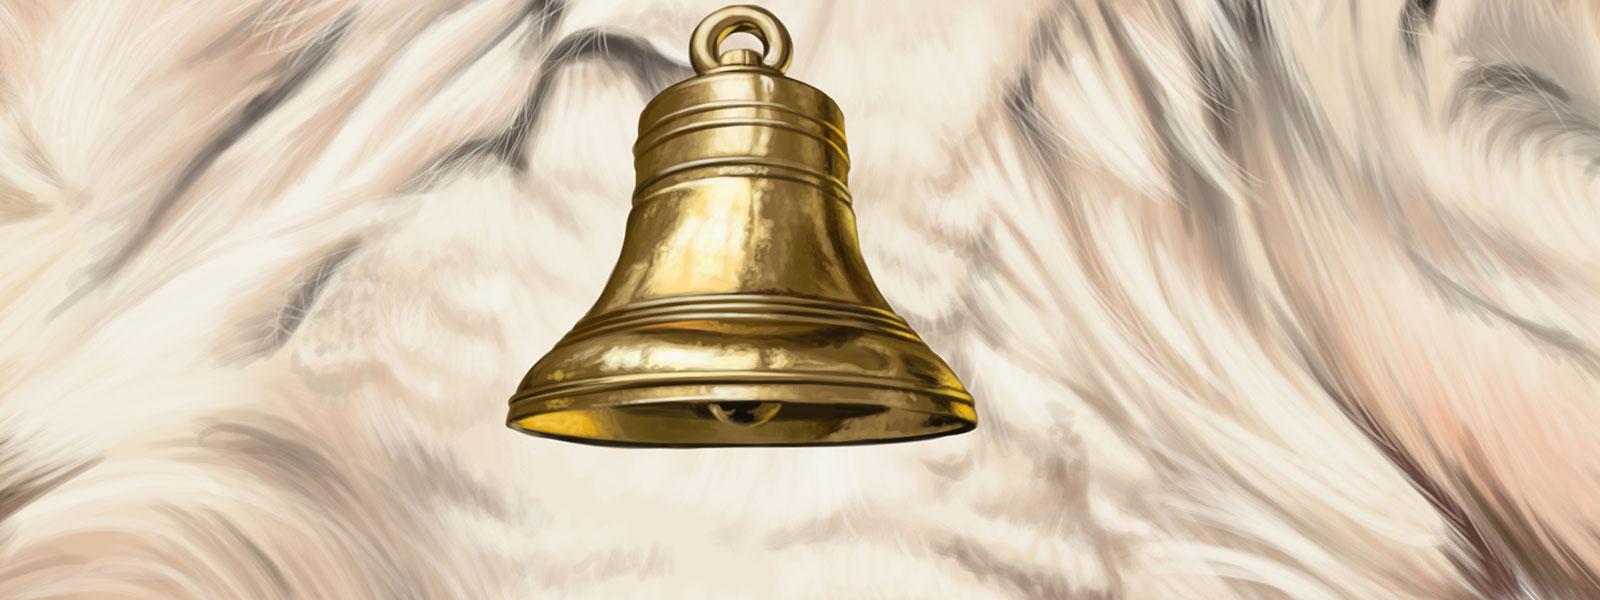 Bell Details